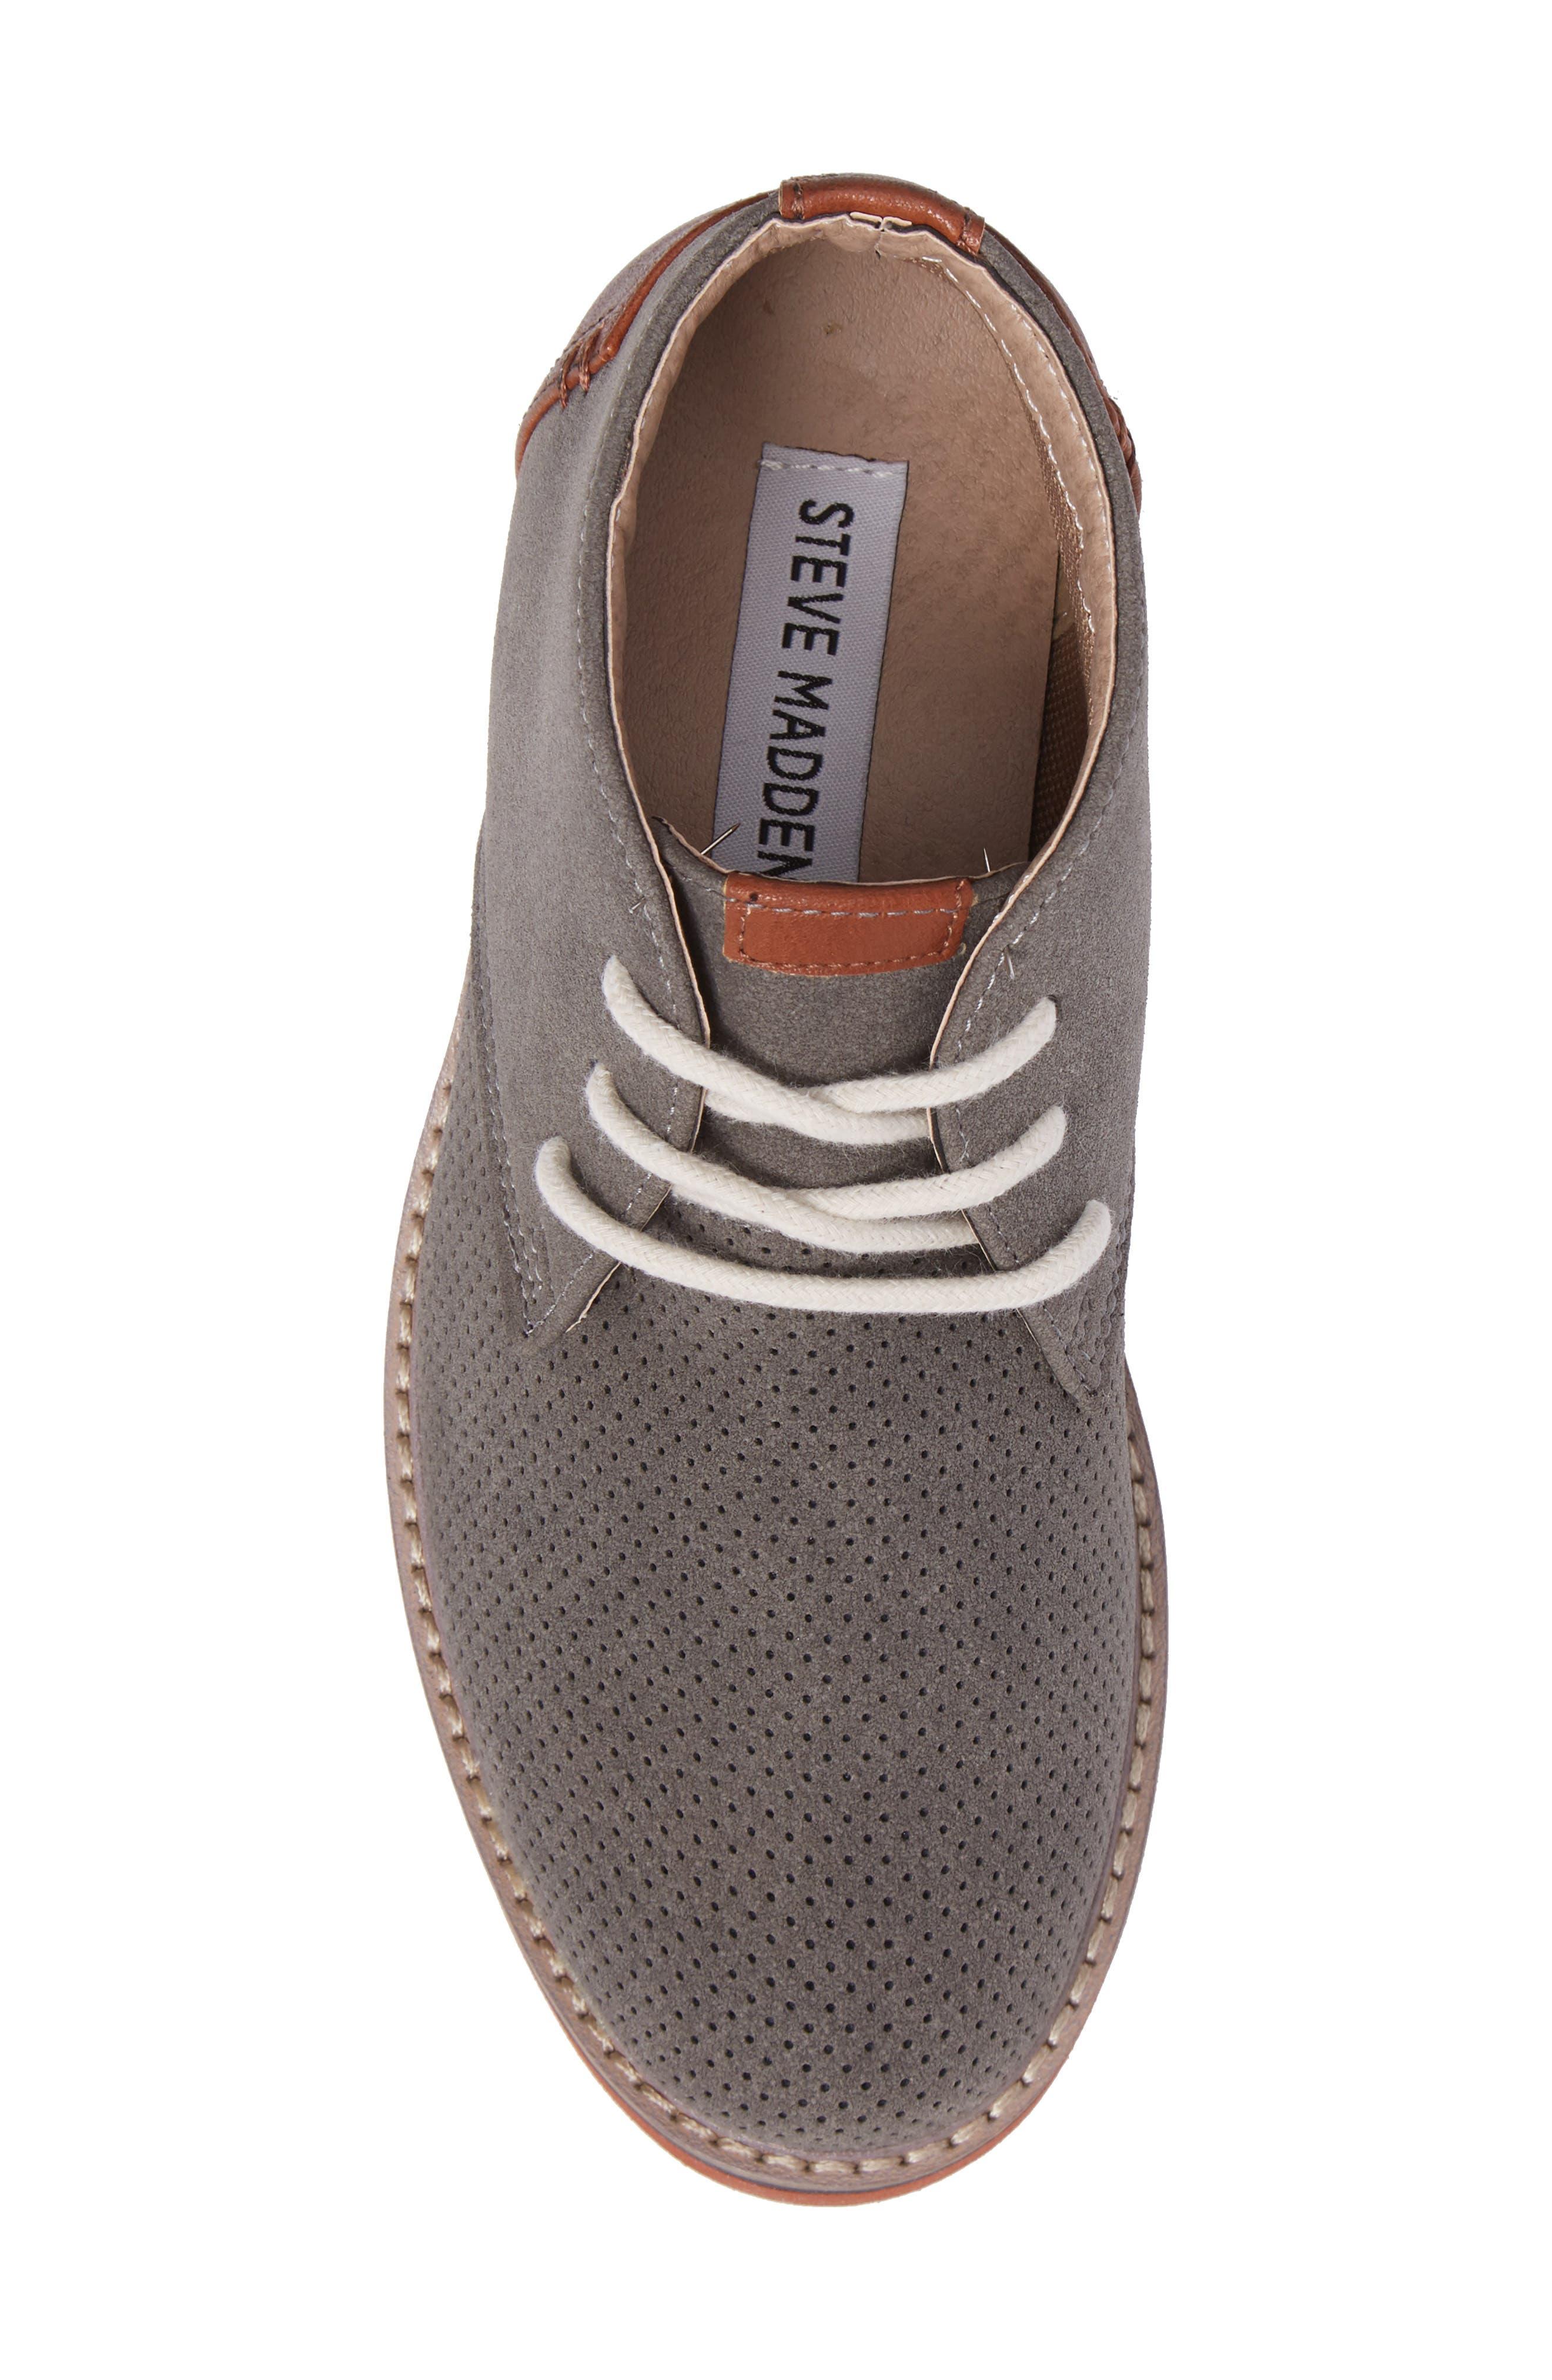 Baden Perforated Chukka Shoe,                             Alternate thumbnail 5, color,                             055